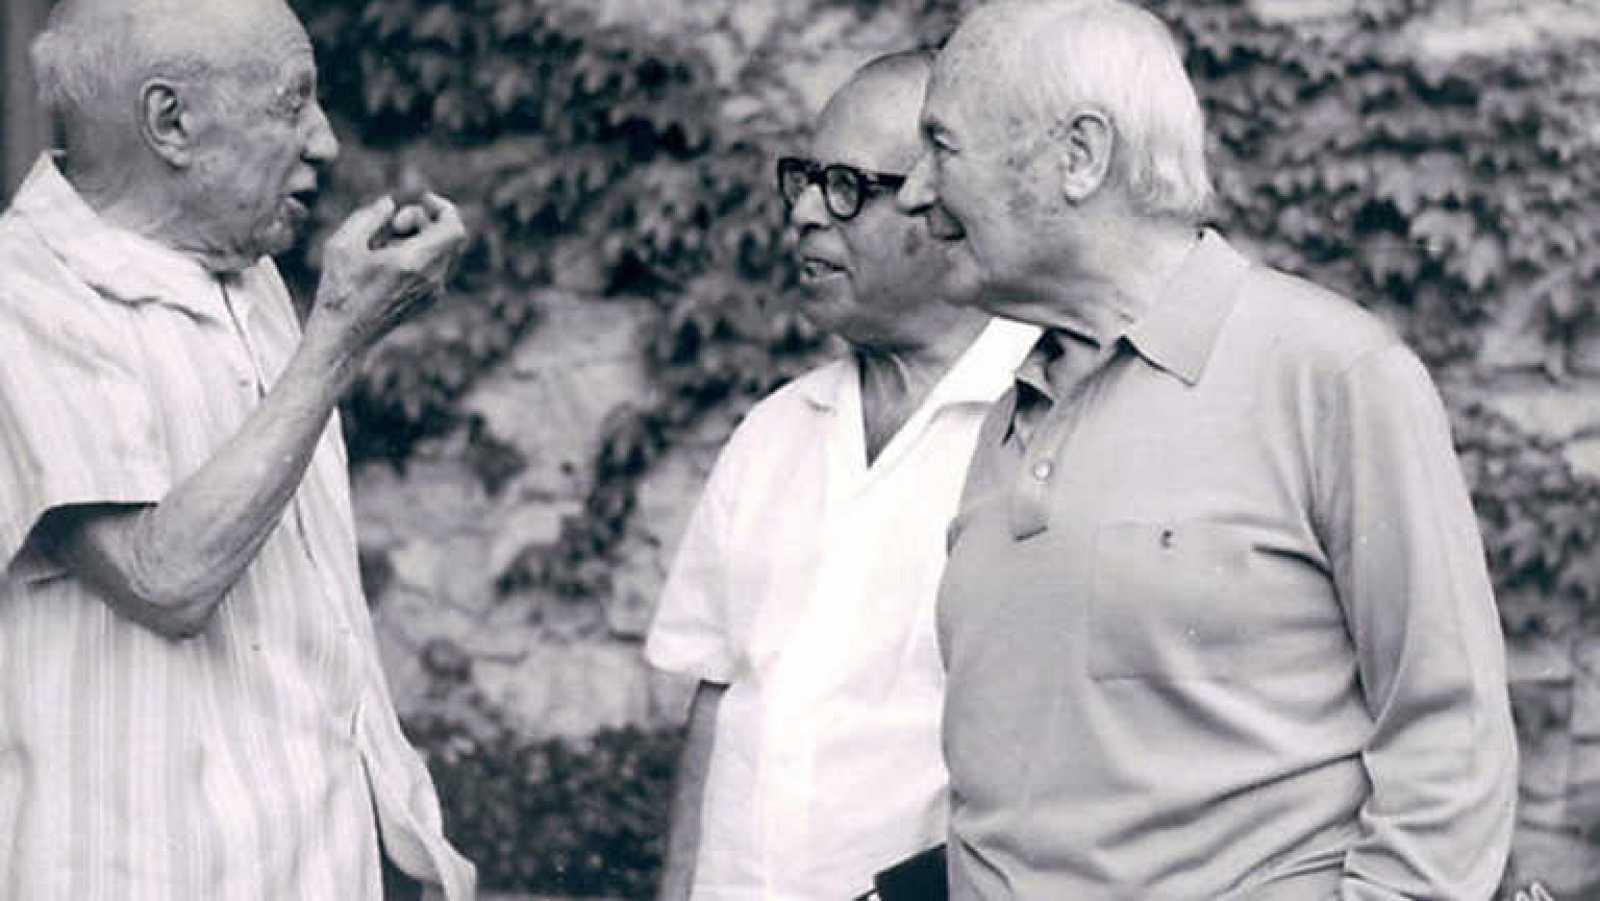 Imprescindibles. Josep Lluís Sert: un sueño nómada